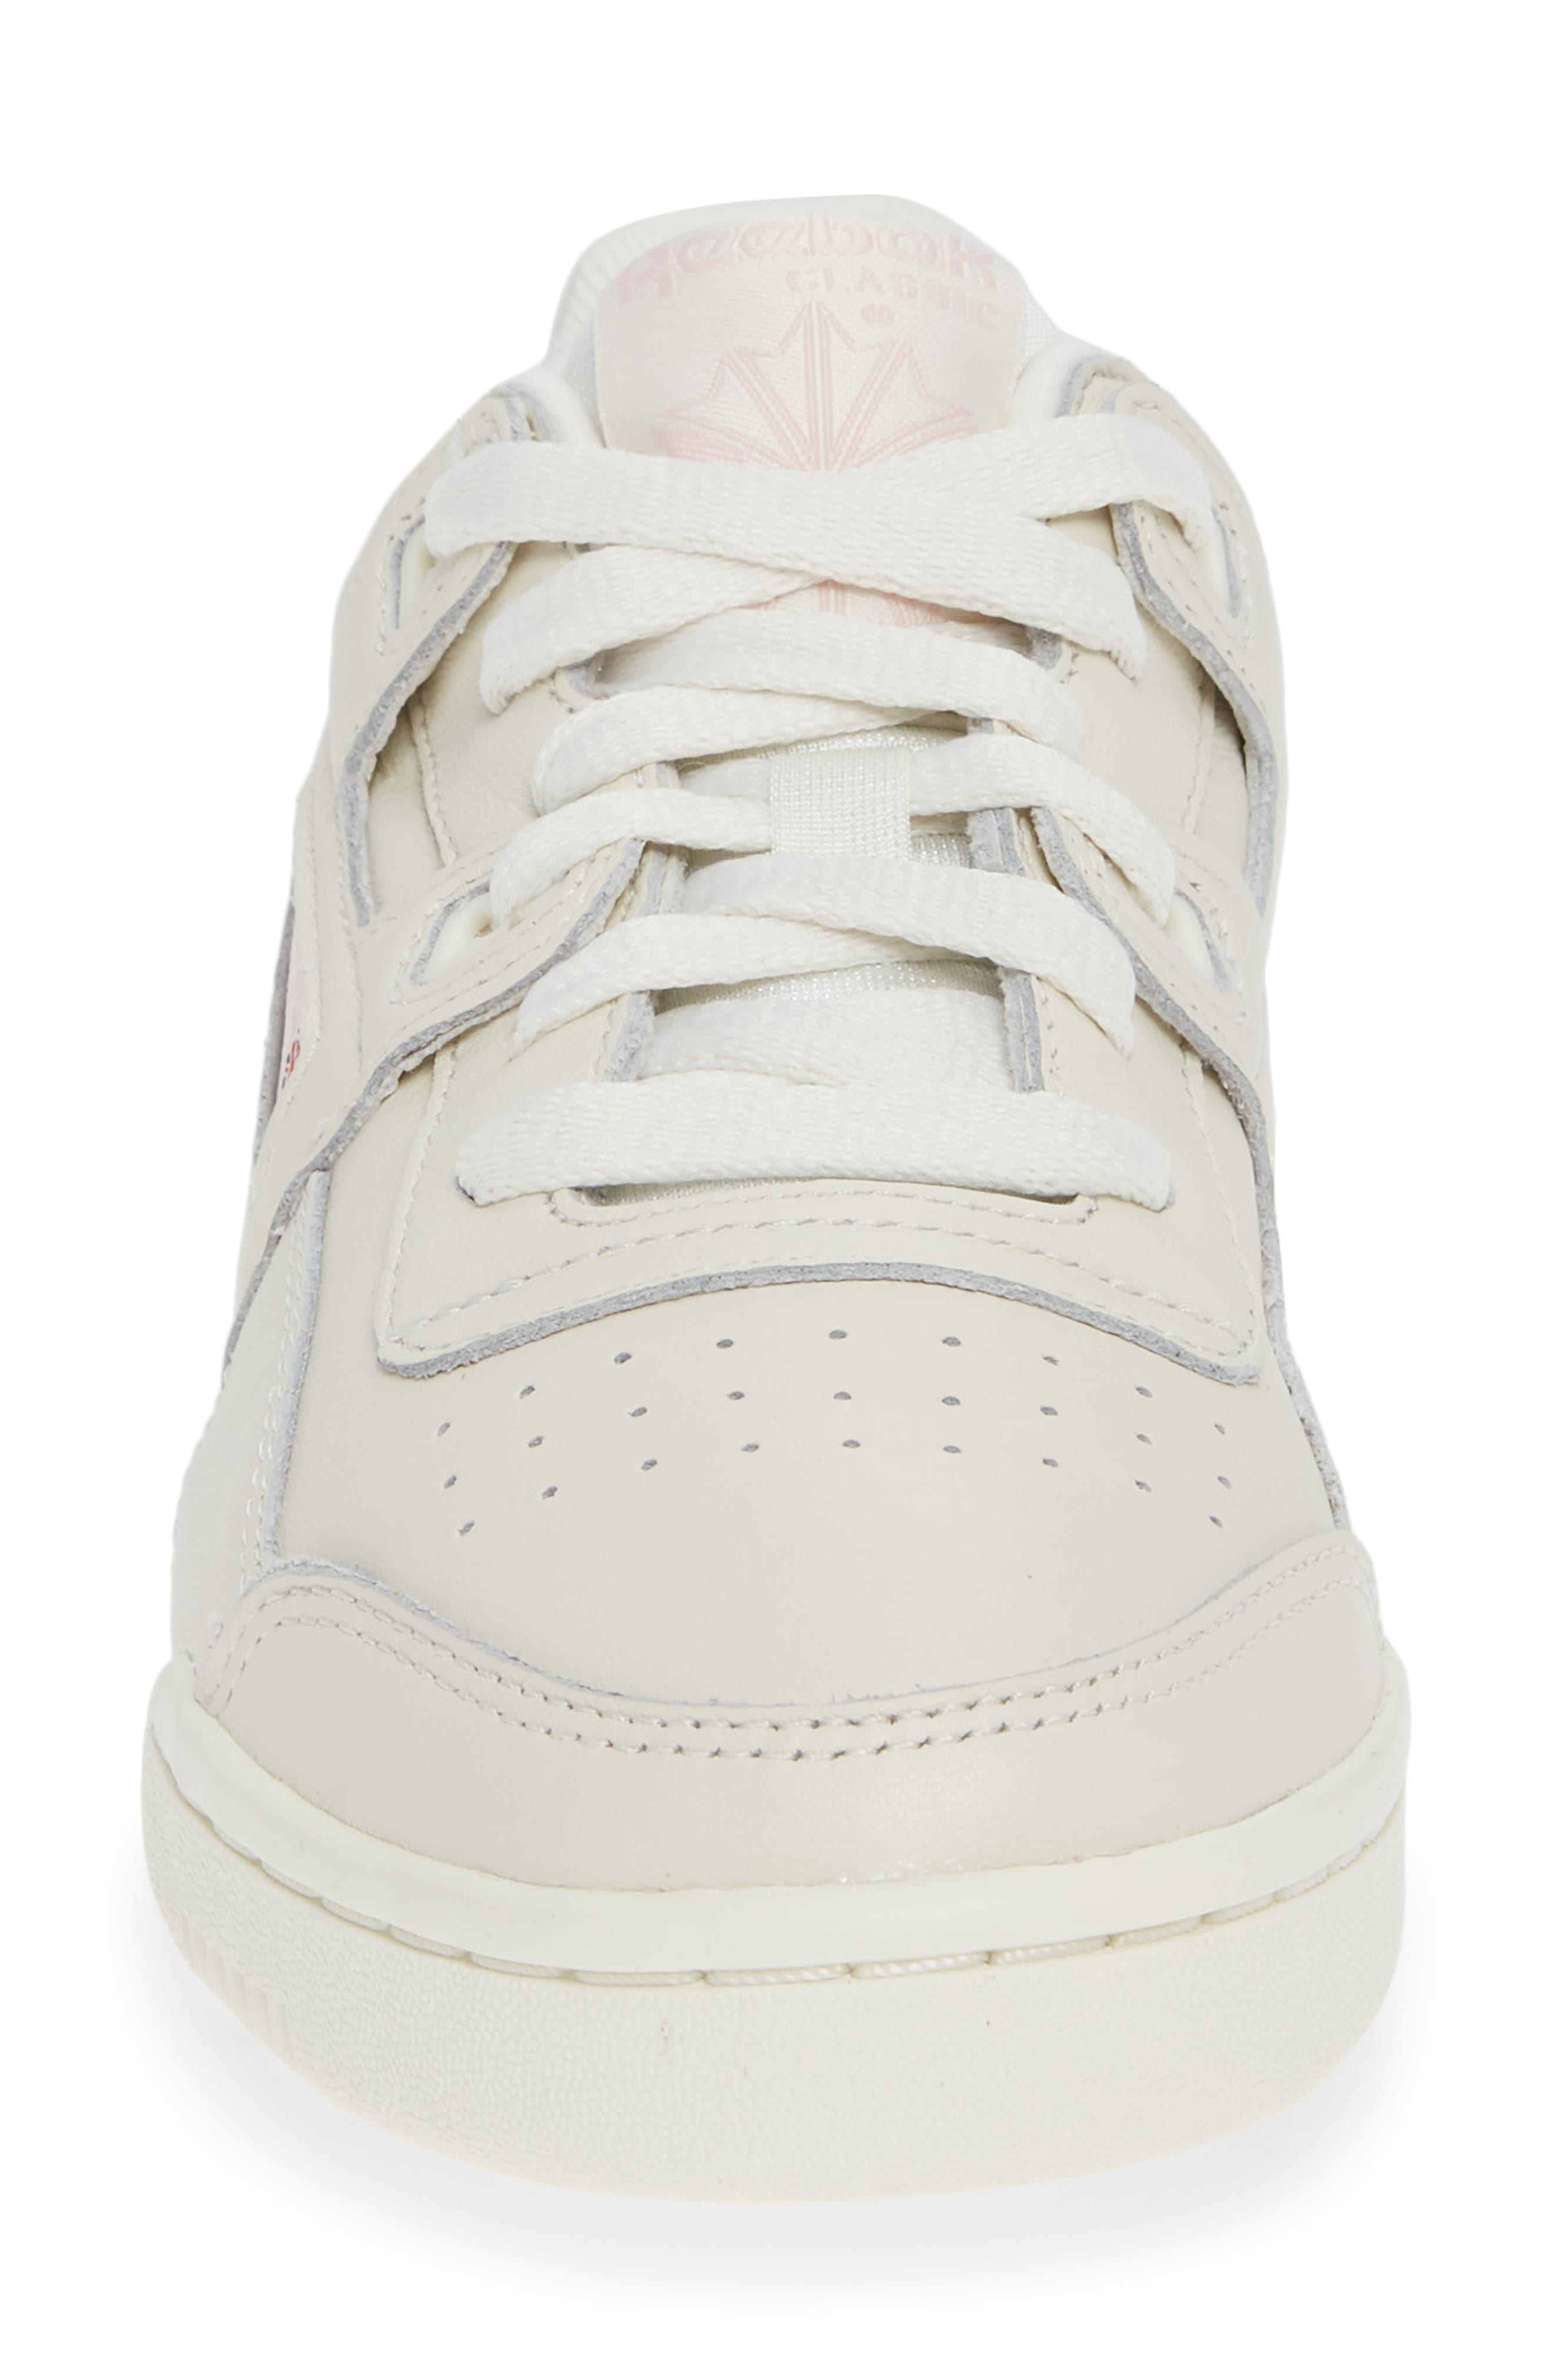 Workout Low Plus Sneaker,                             Alternate thumbnail 4, color,                             WHITE/ PRACTICAL PINK